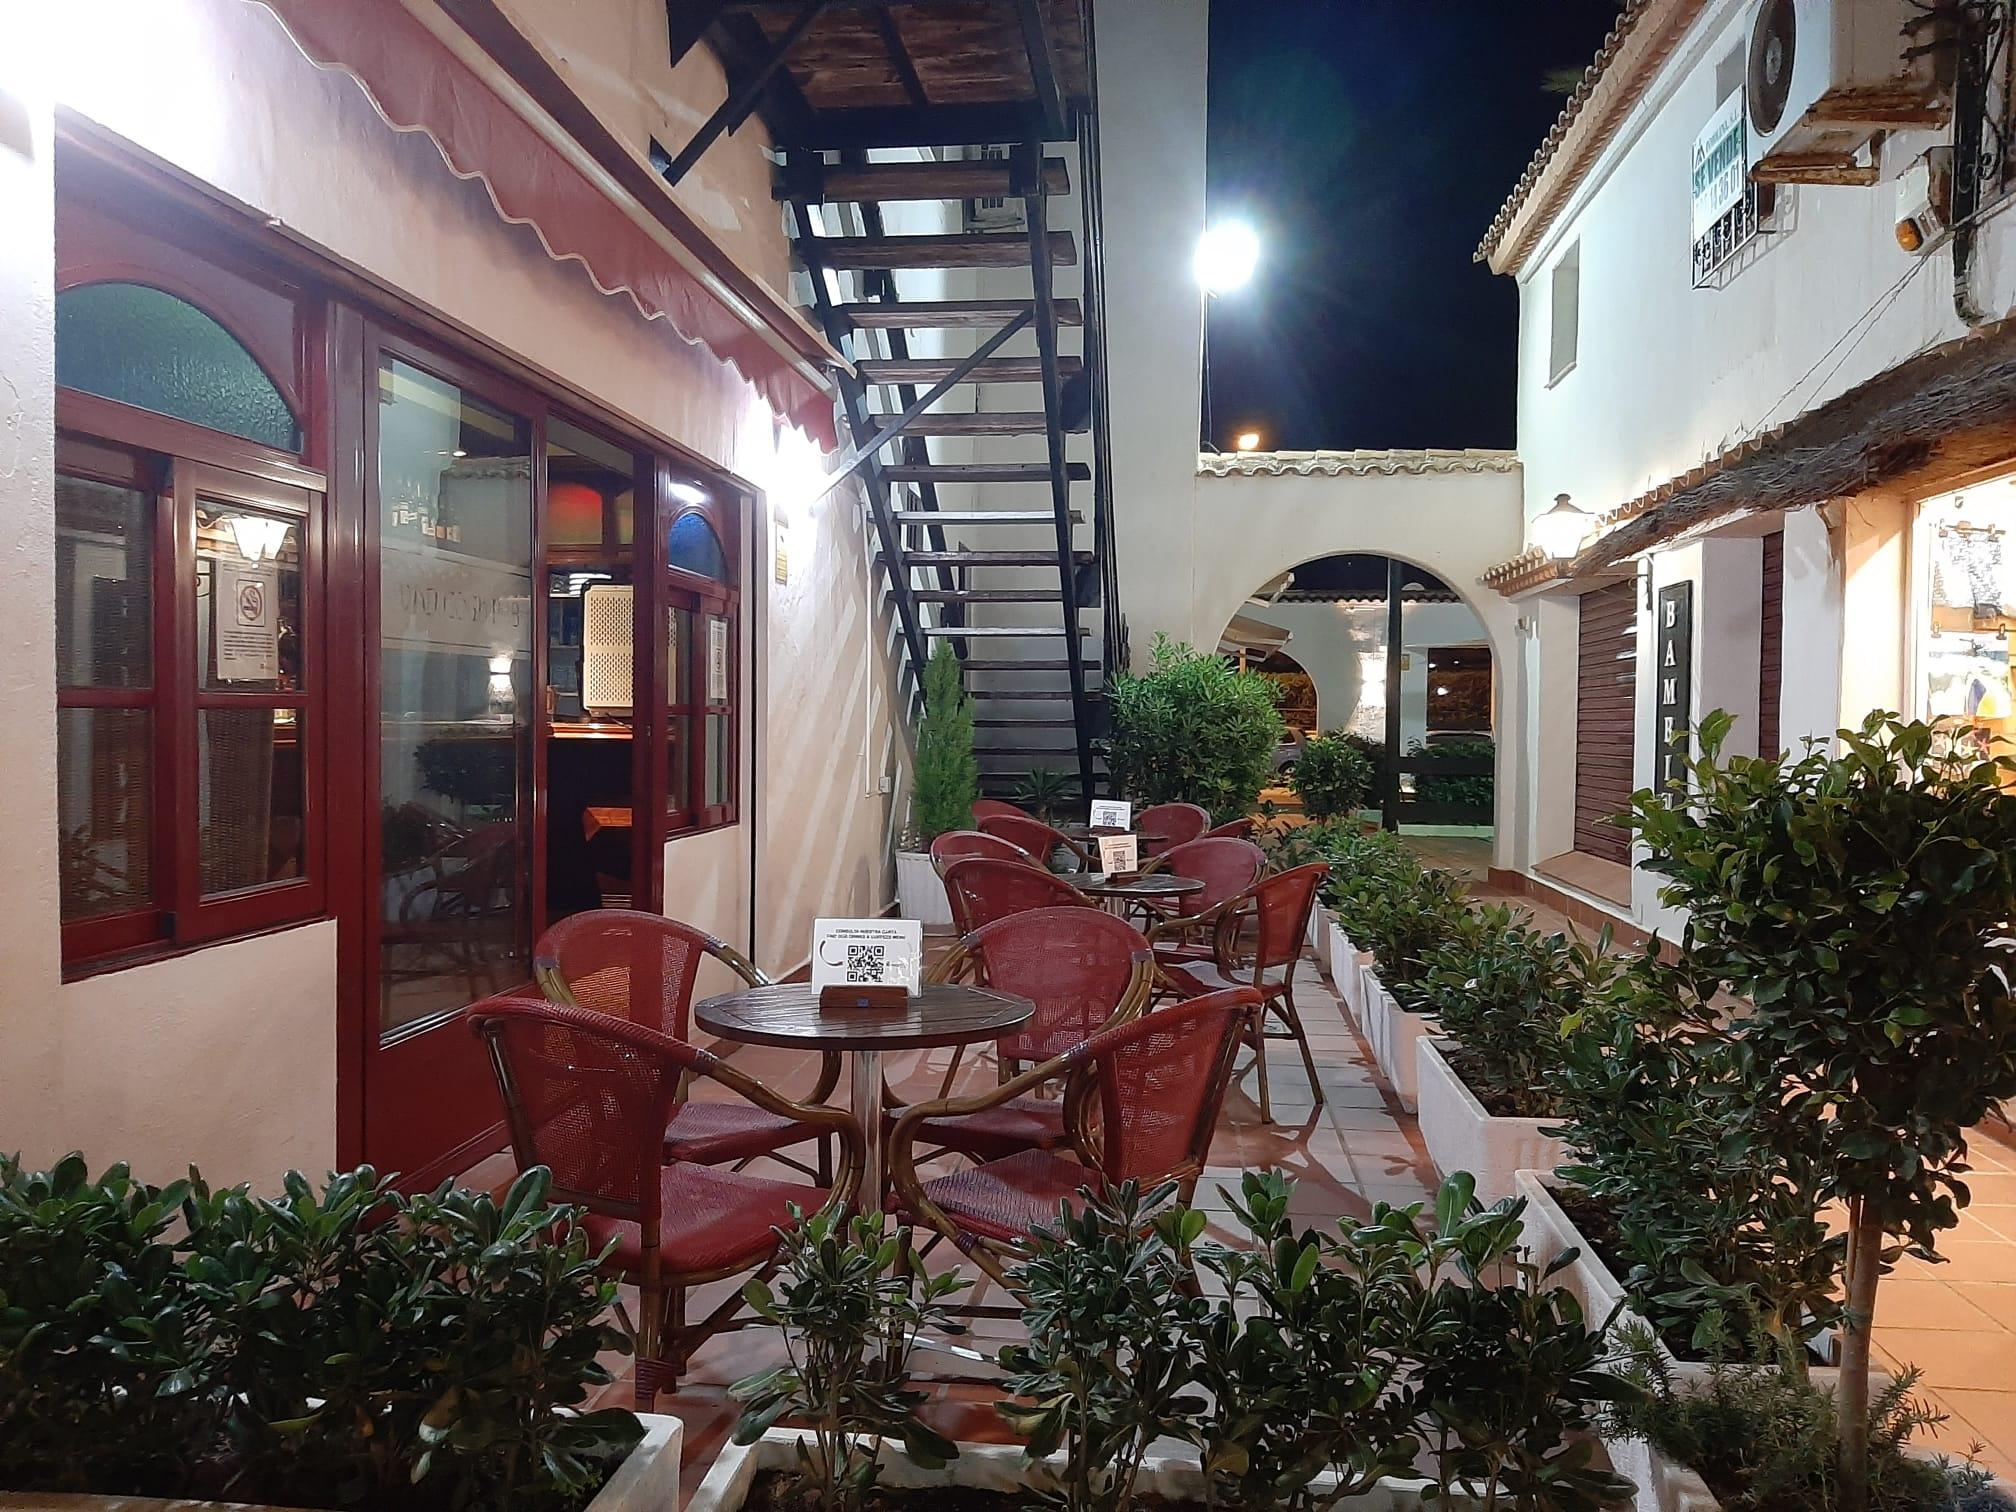 van-gogh-pub-terraza-lateral-2